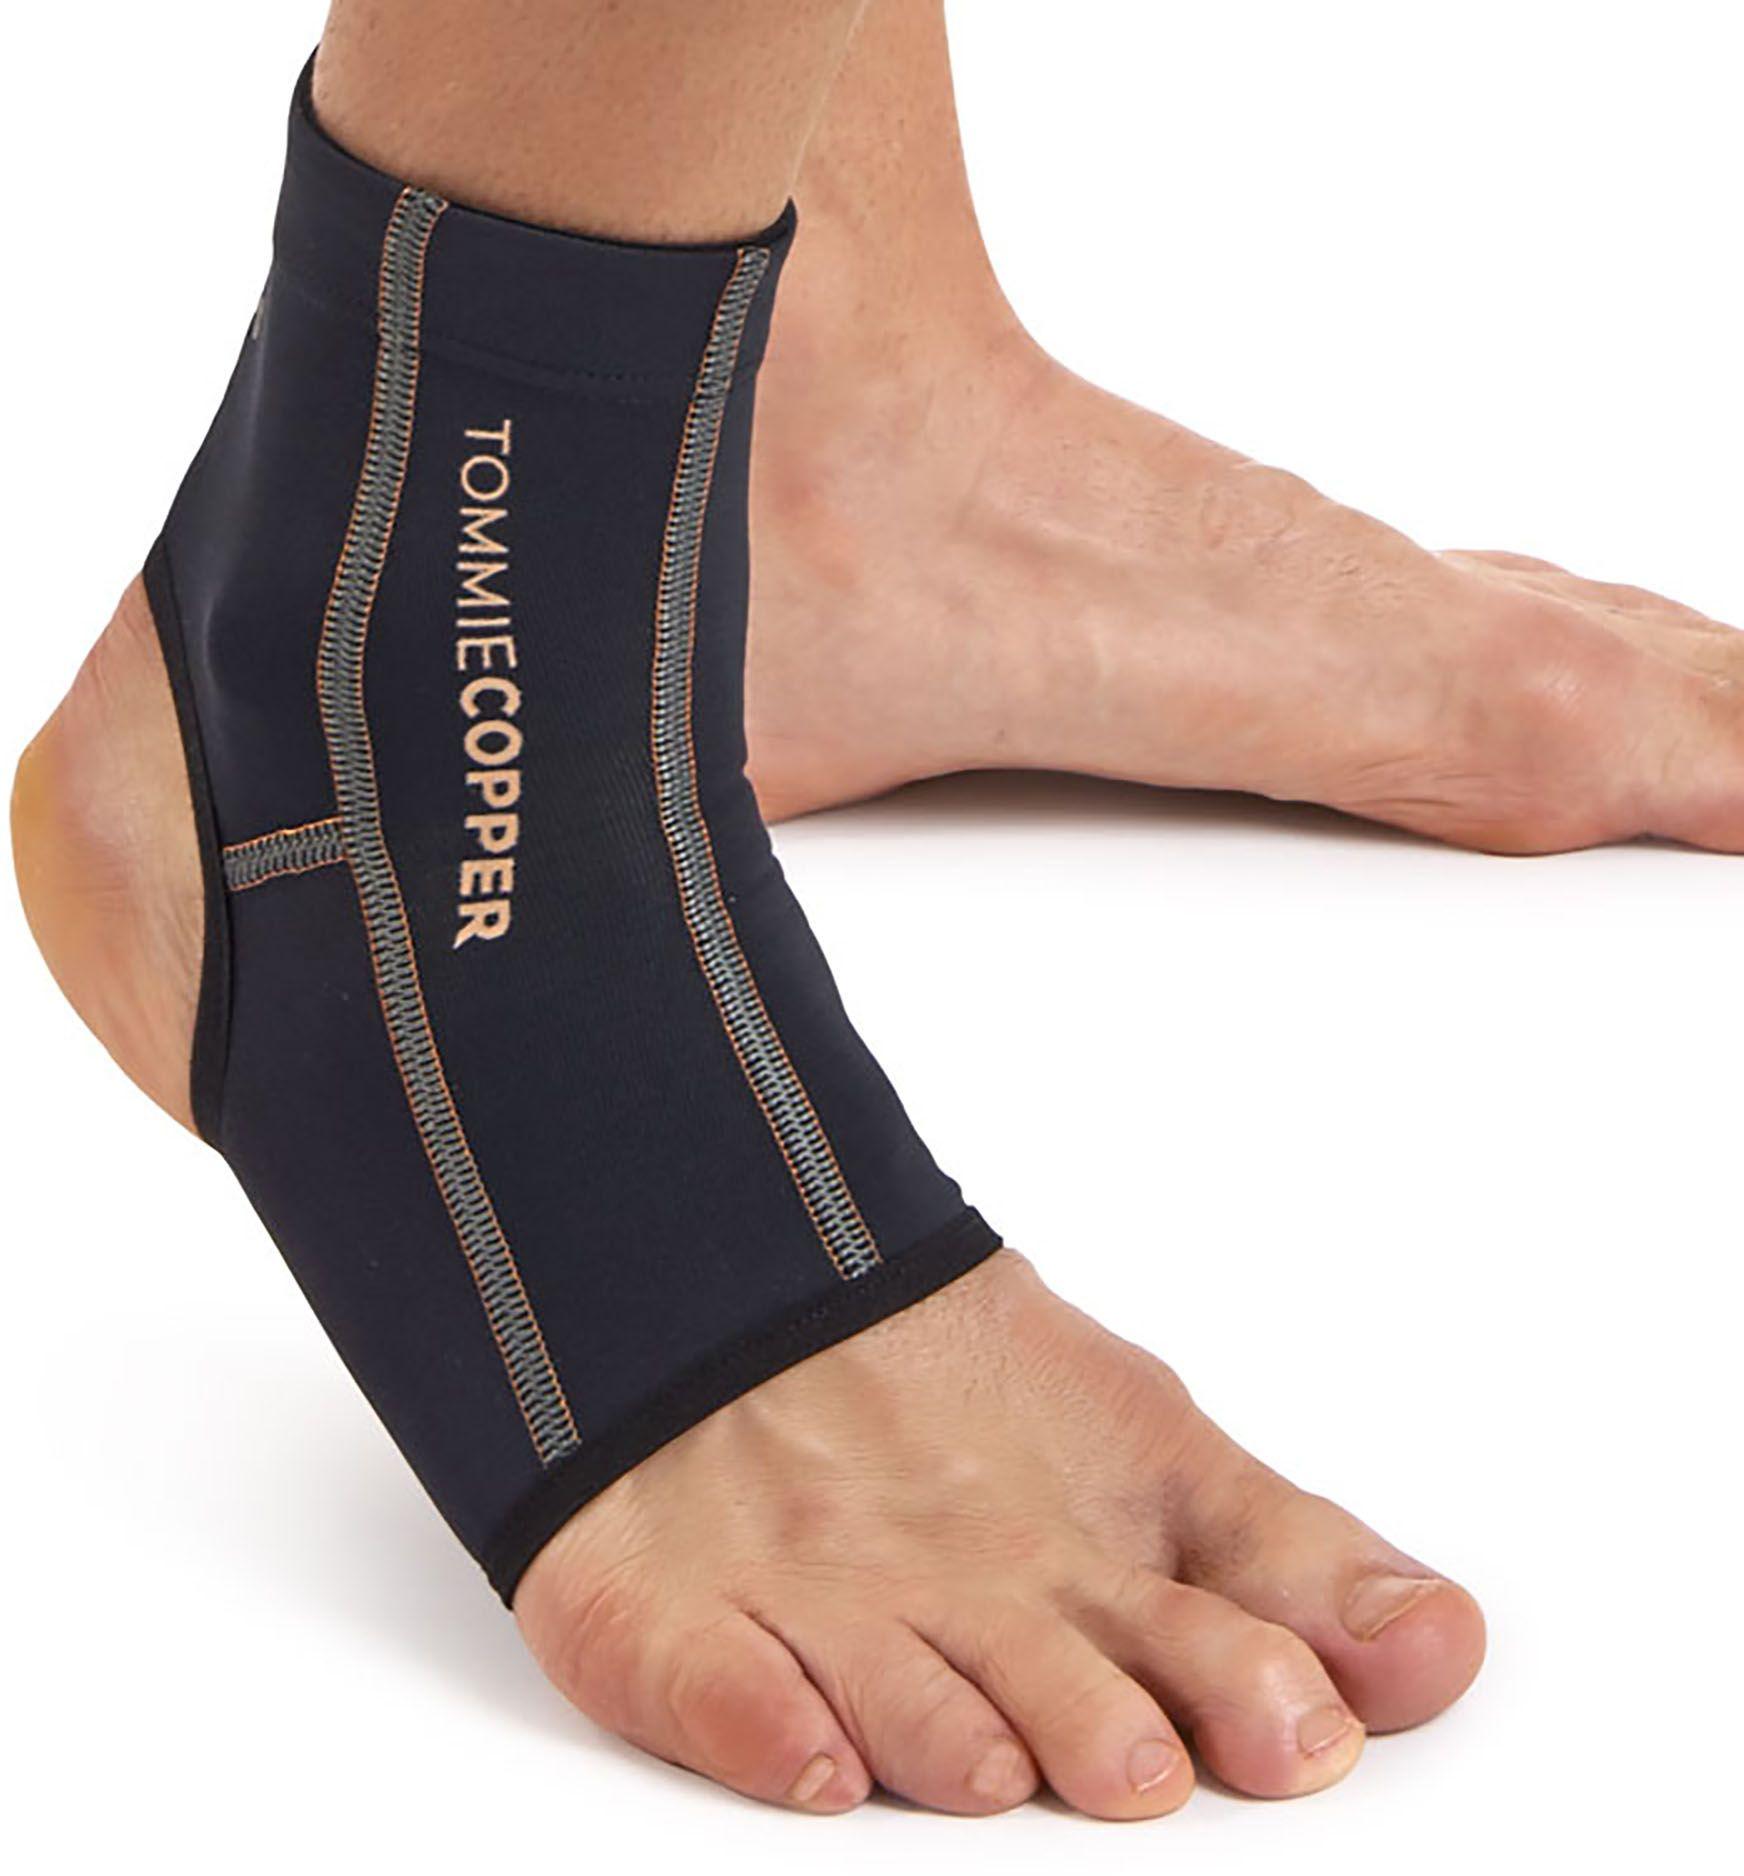 YF Unisex Adult Animal Foot Print Simulation Tube Stockings 3D Paw Pattern Crew Socks